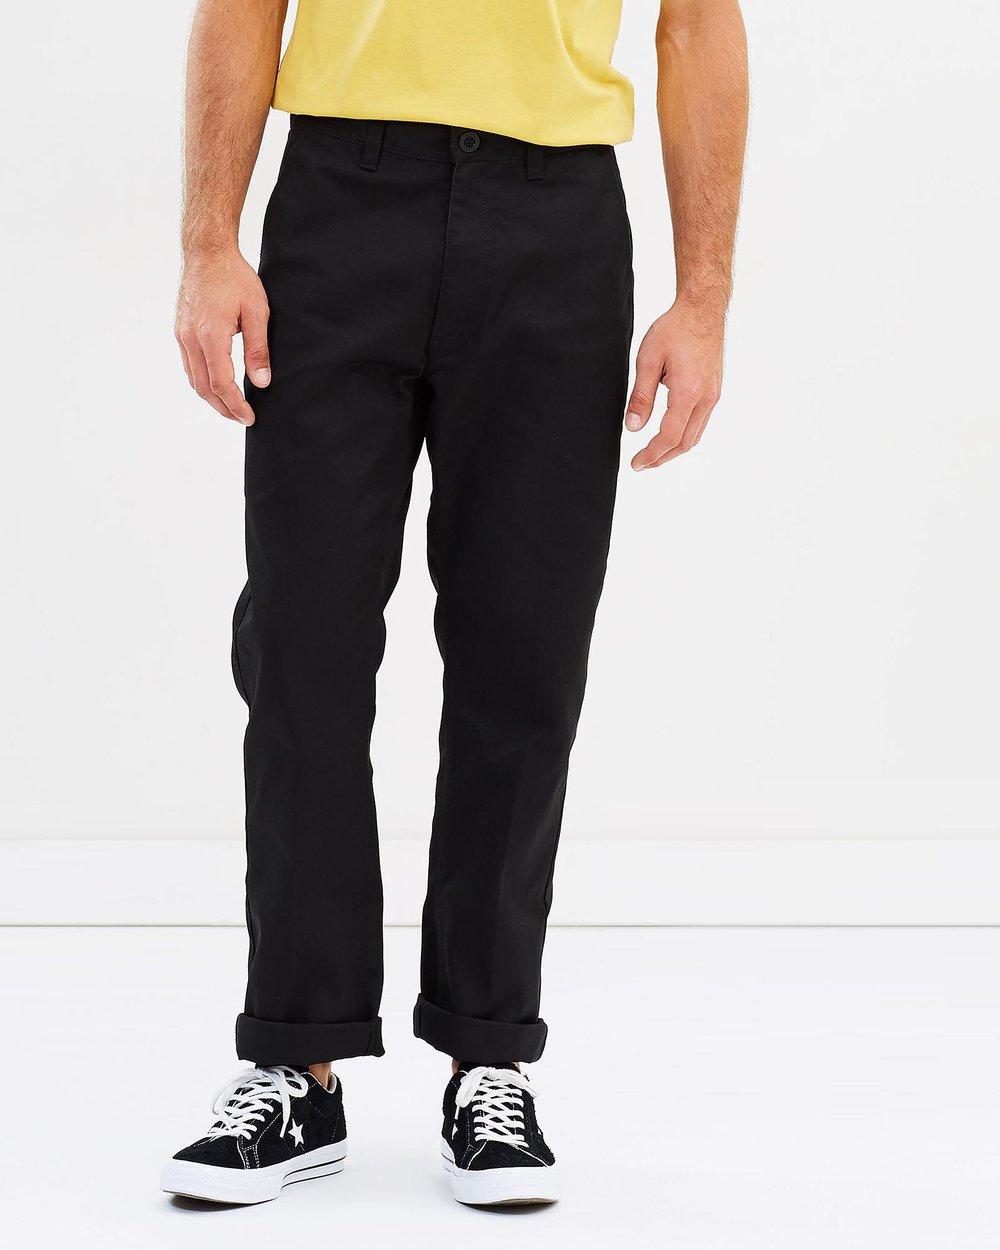 Fleet Rigid Chino Pants by Brixton Online  90bbdc2777c